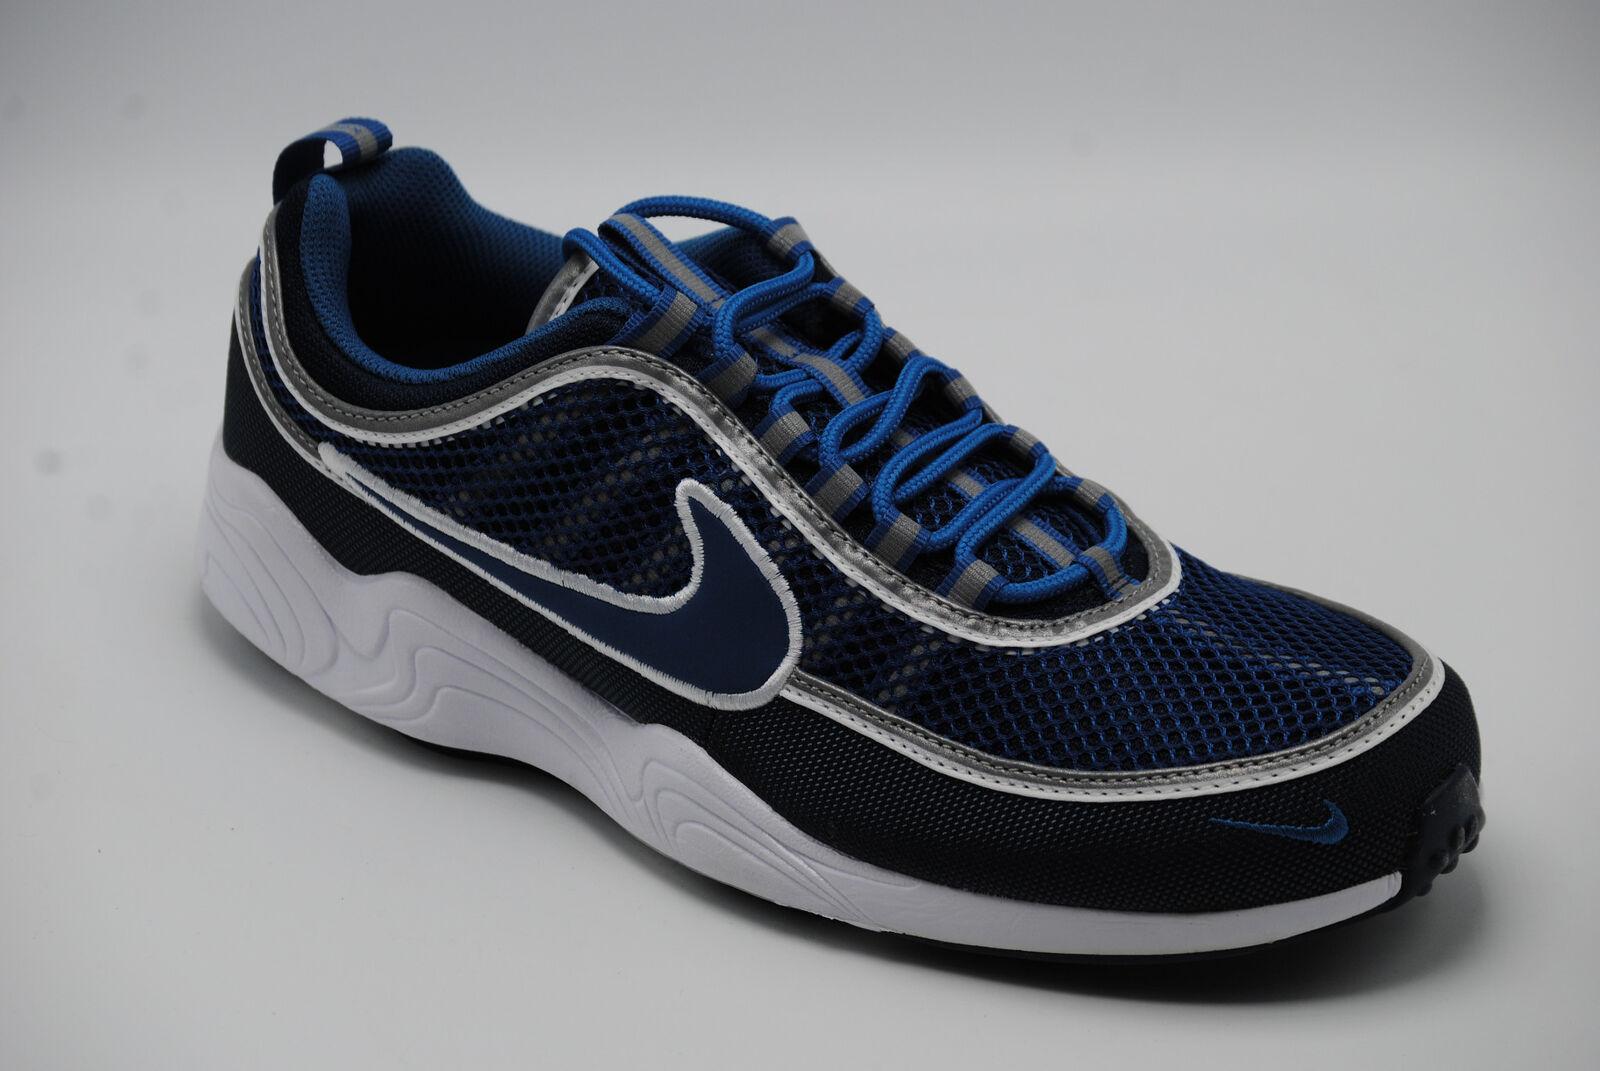 Nike air zoom spiridon 16 uomini scarpe da da scarpe corsa 926955 400 diverse confezioni da83cd